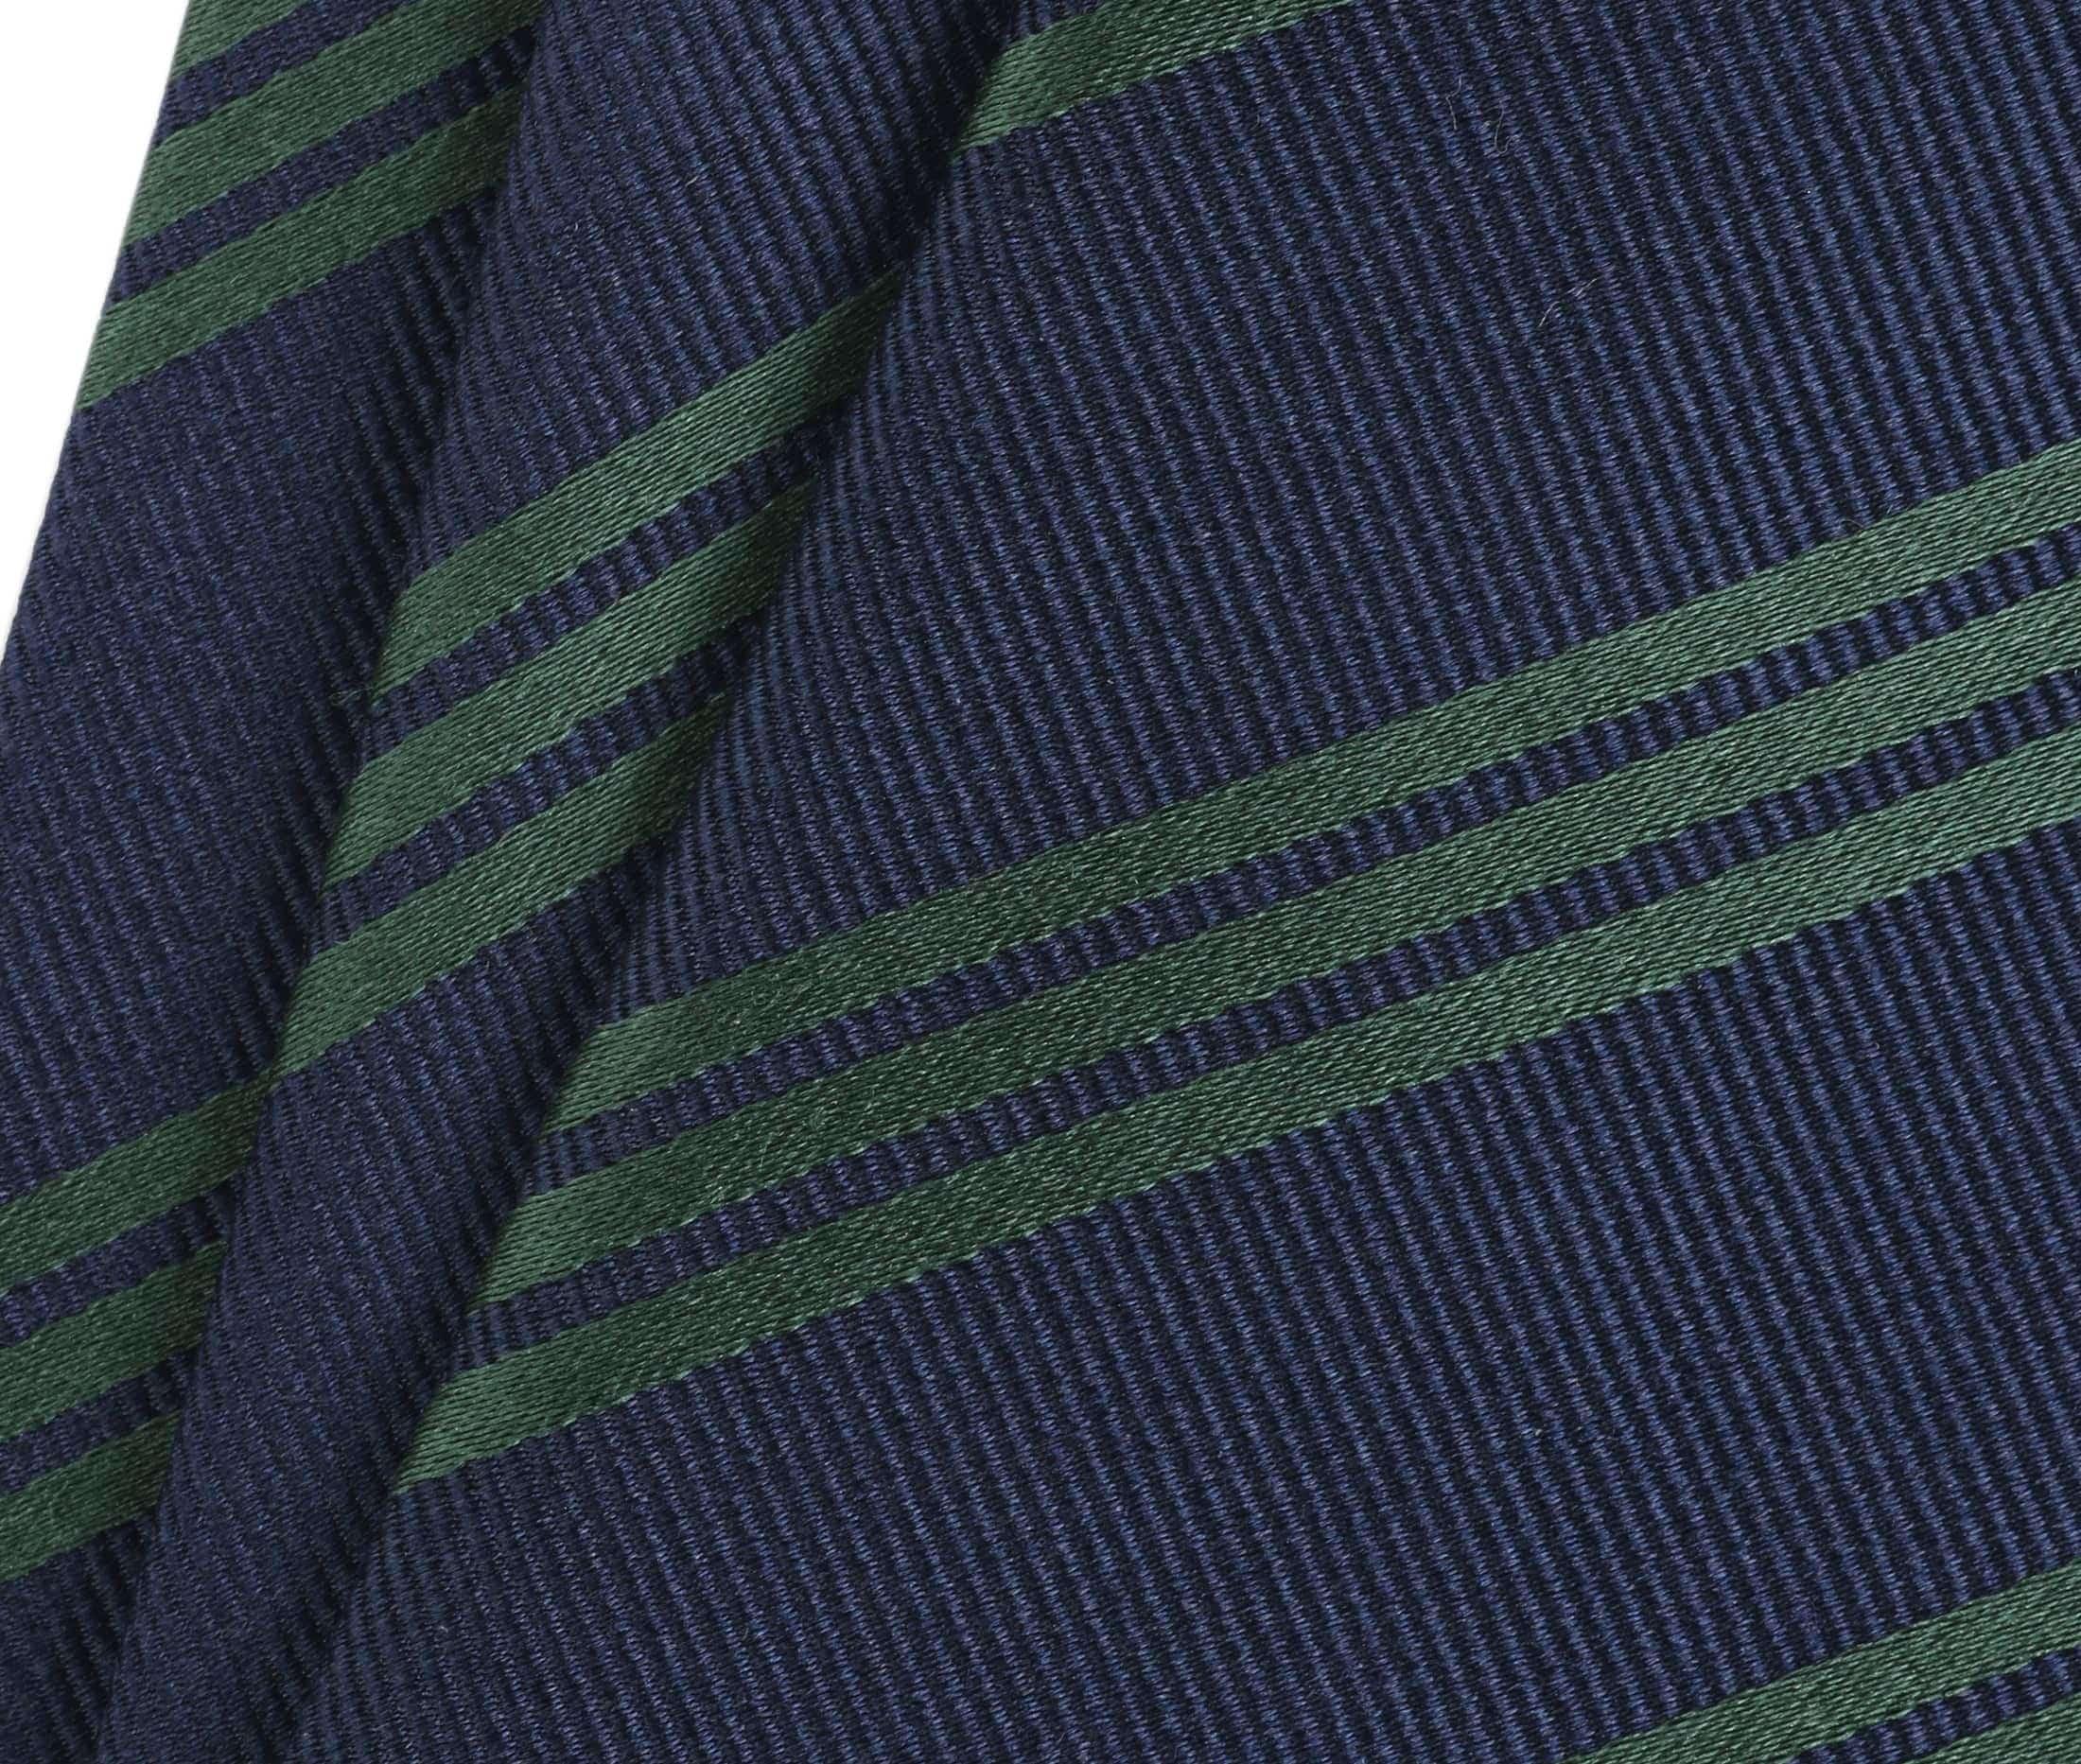 Krawatte Seide Streifen Navy Grun foto 1